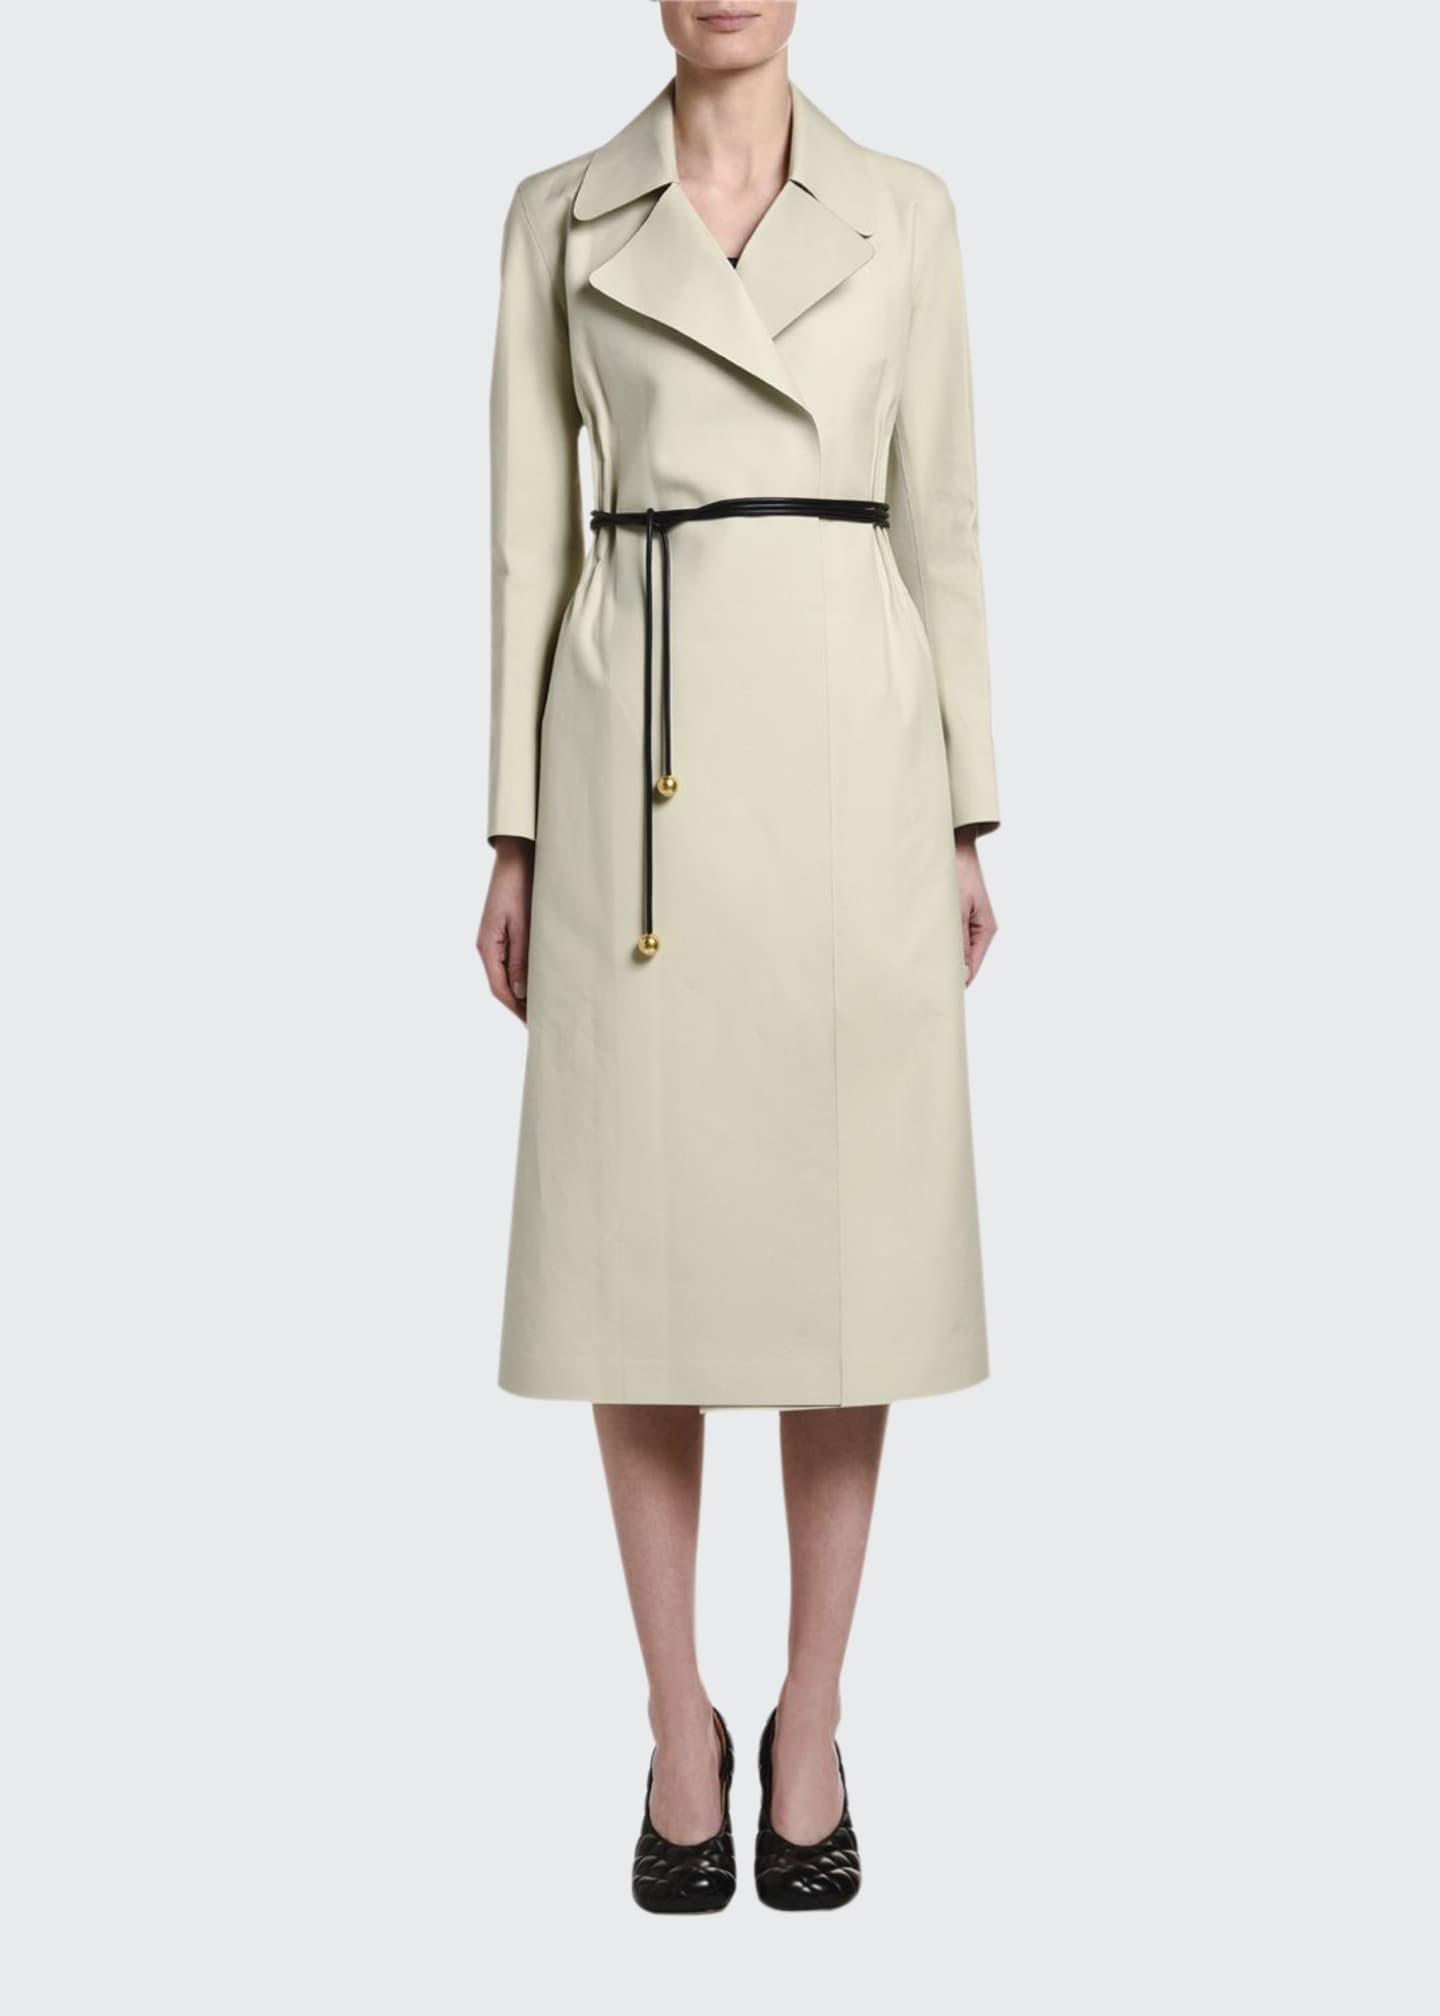 Bottega Veneta Cotton Cinched-Waist Trench Coat